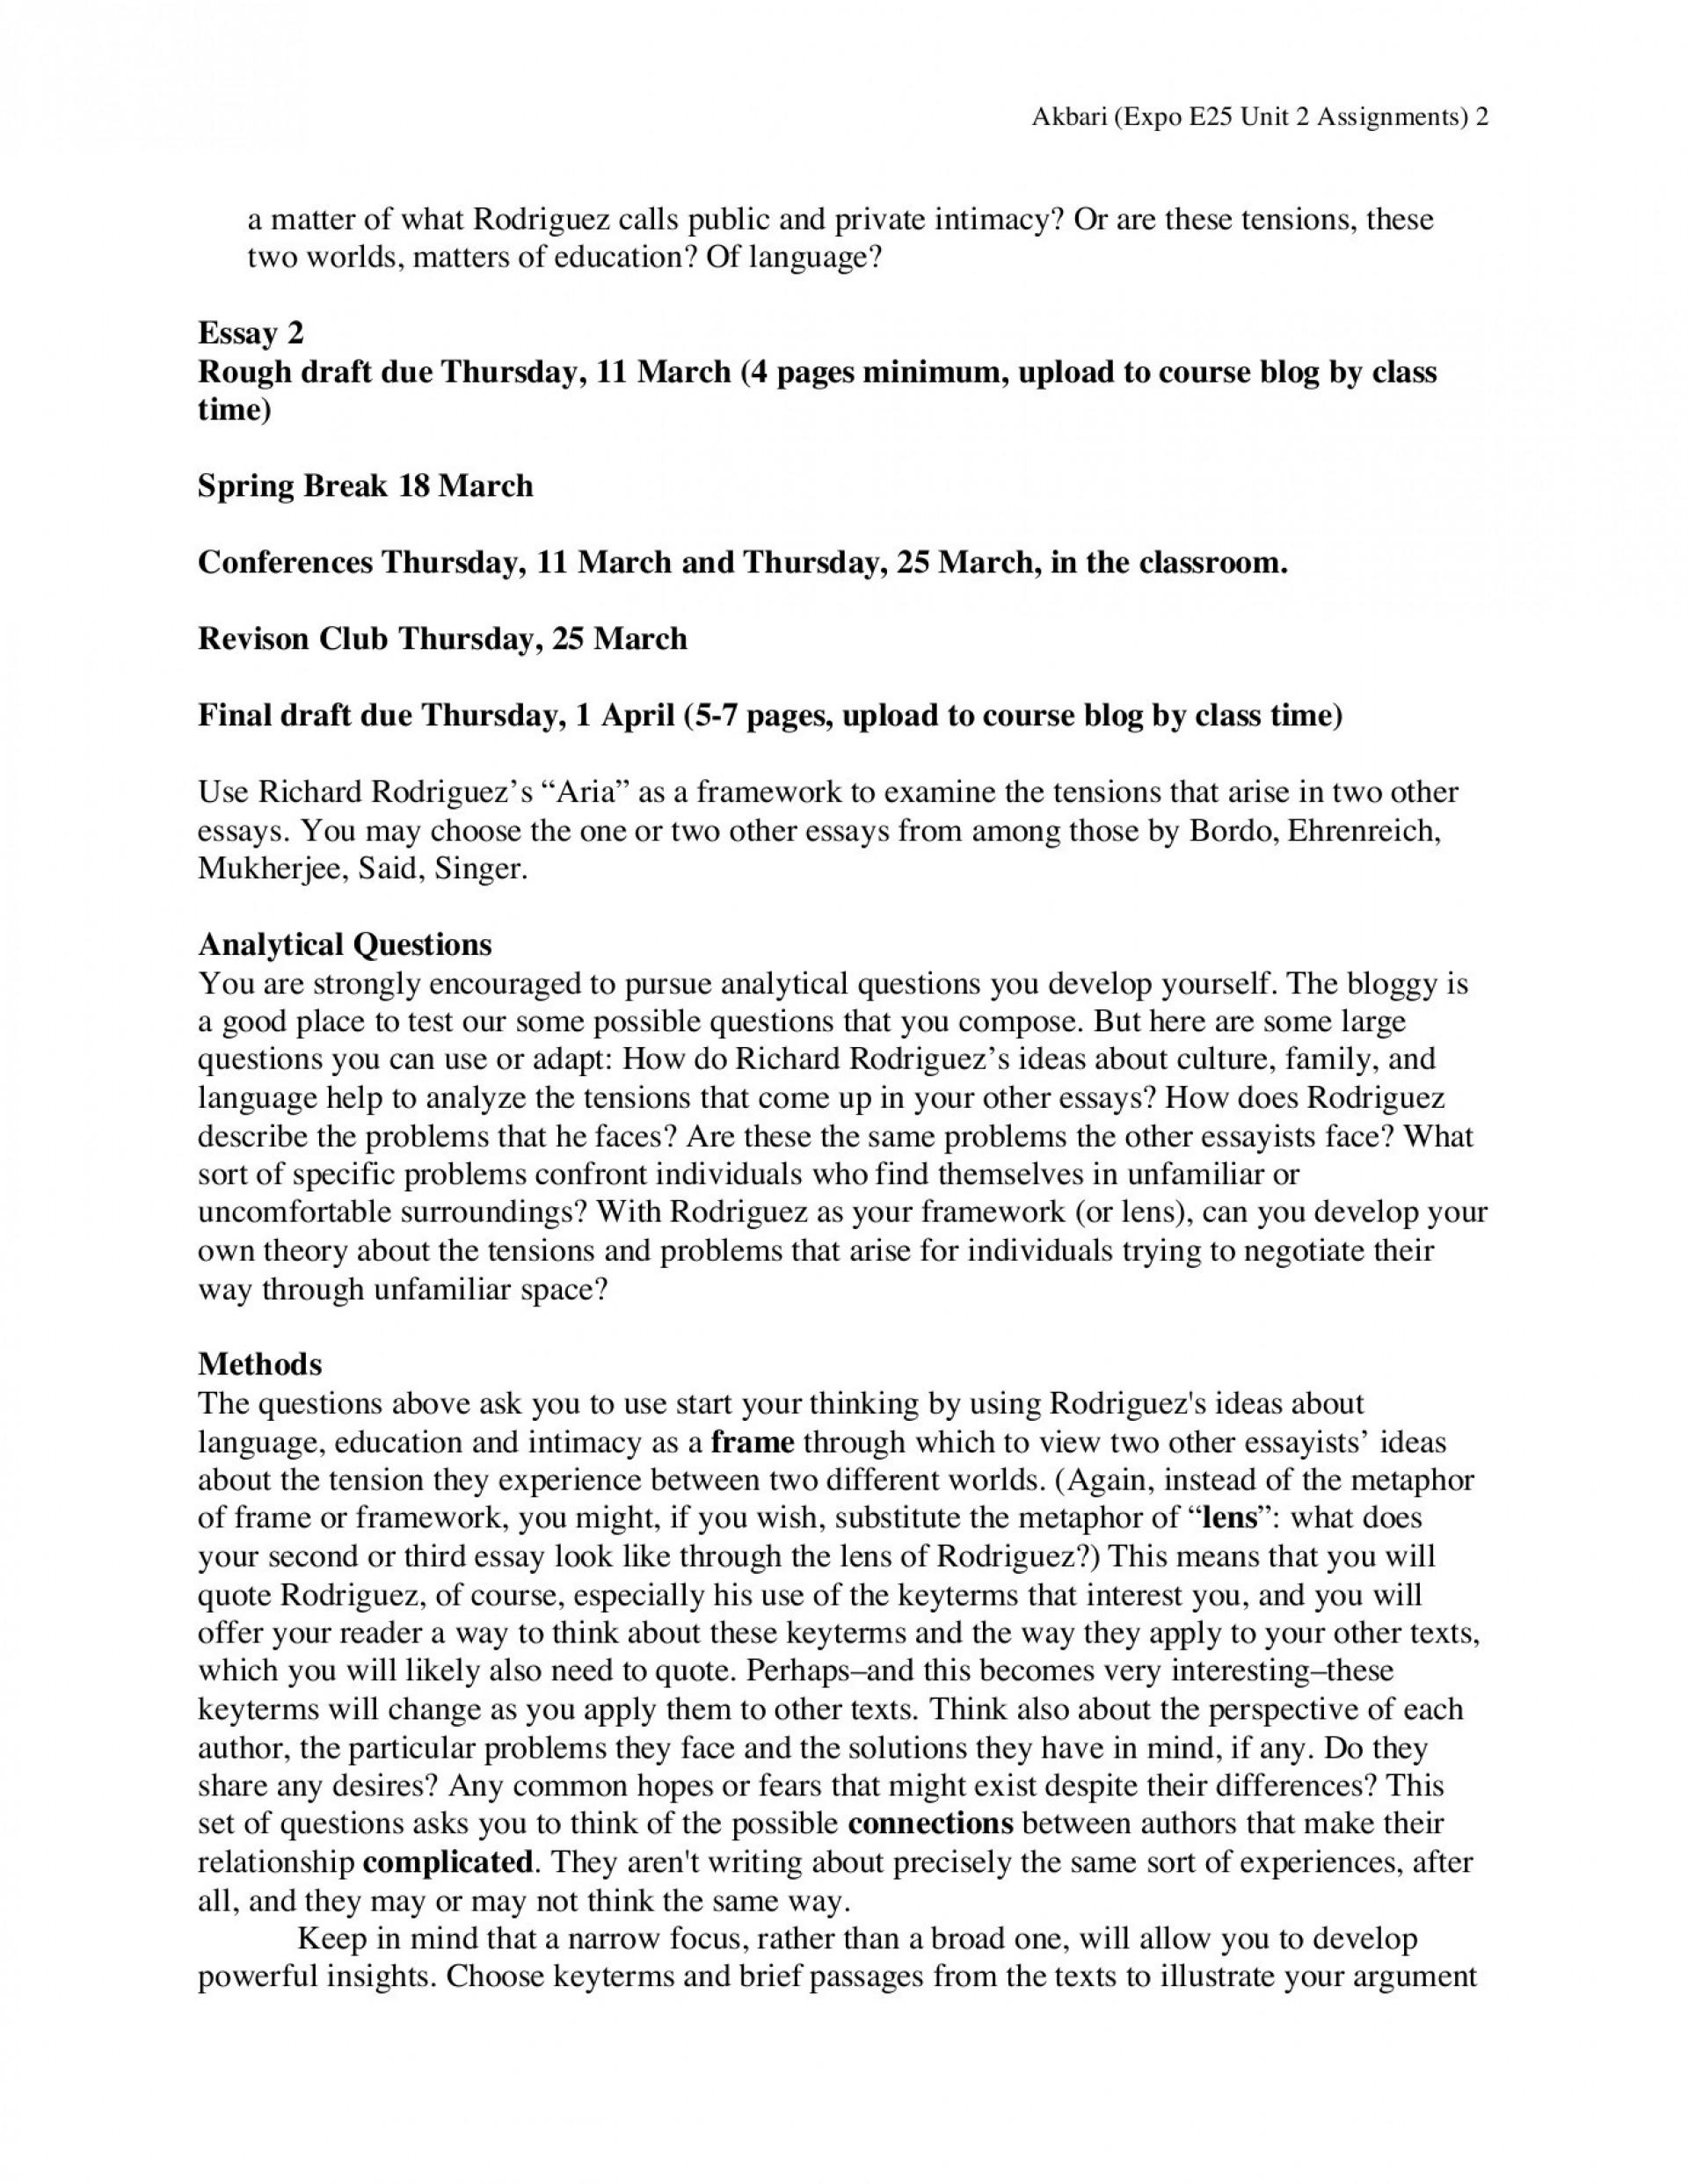 008 Essay Example Spring Stupendous Break Plans Alternative Outline 1920